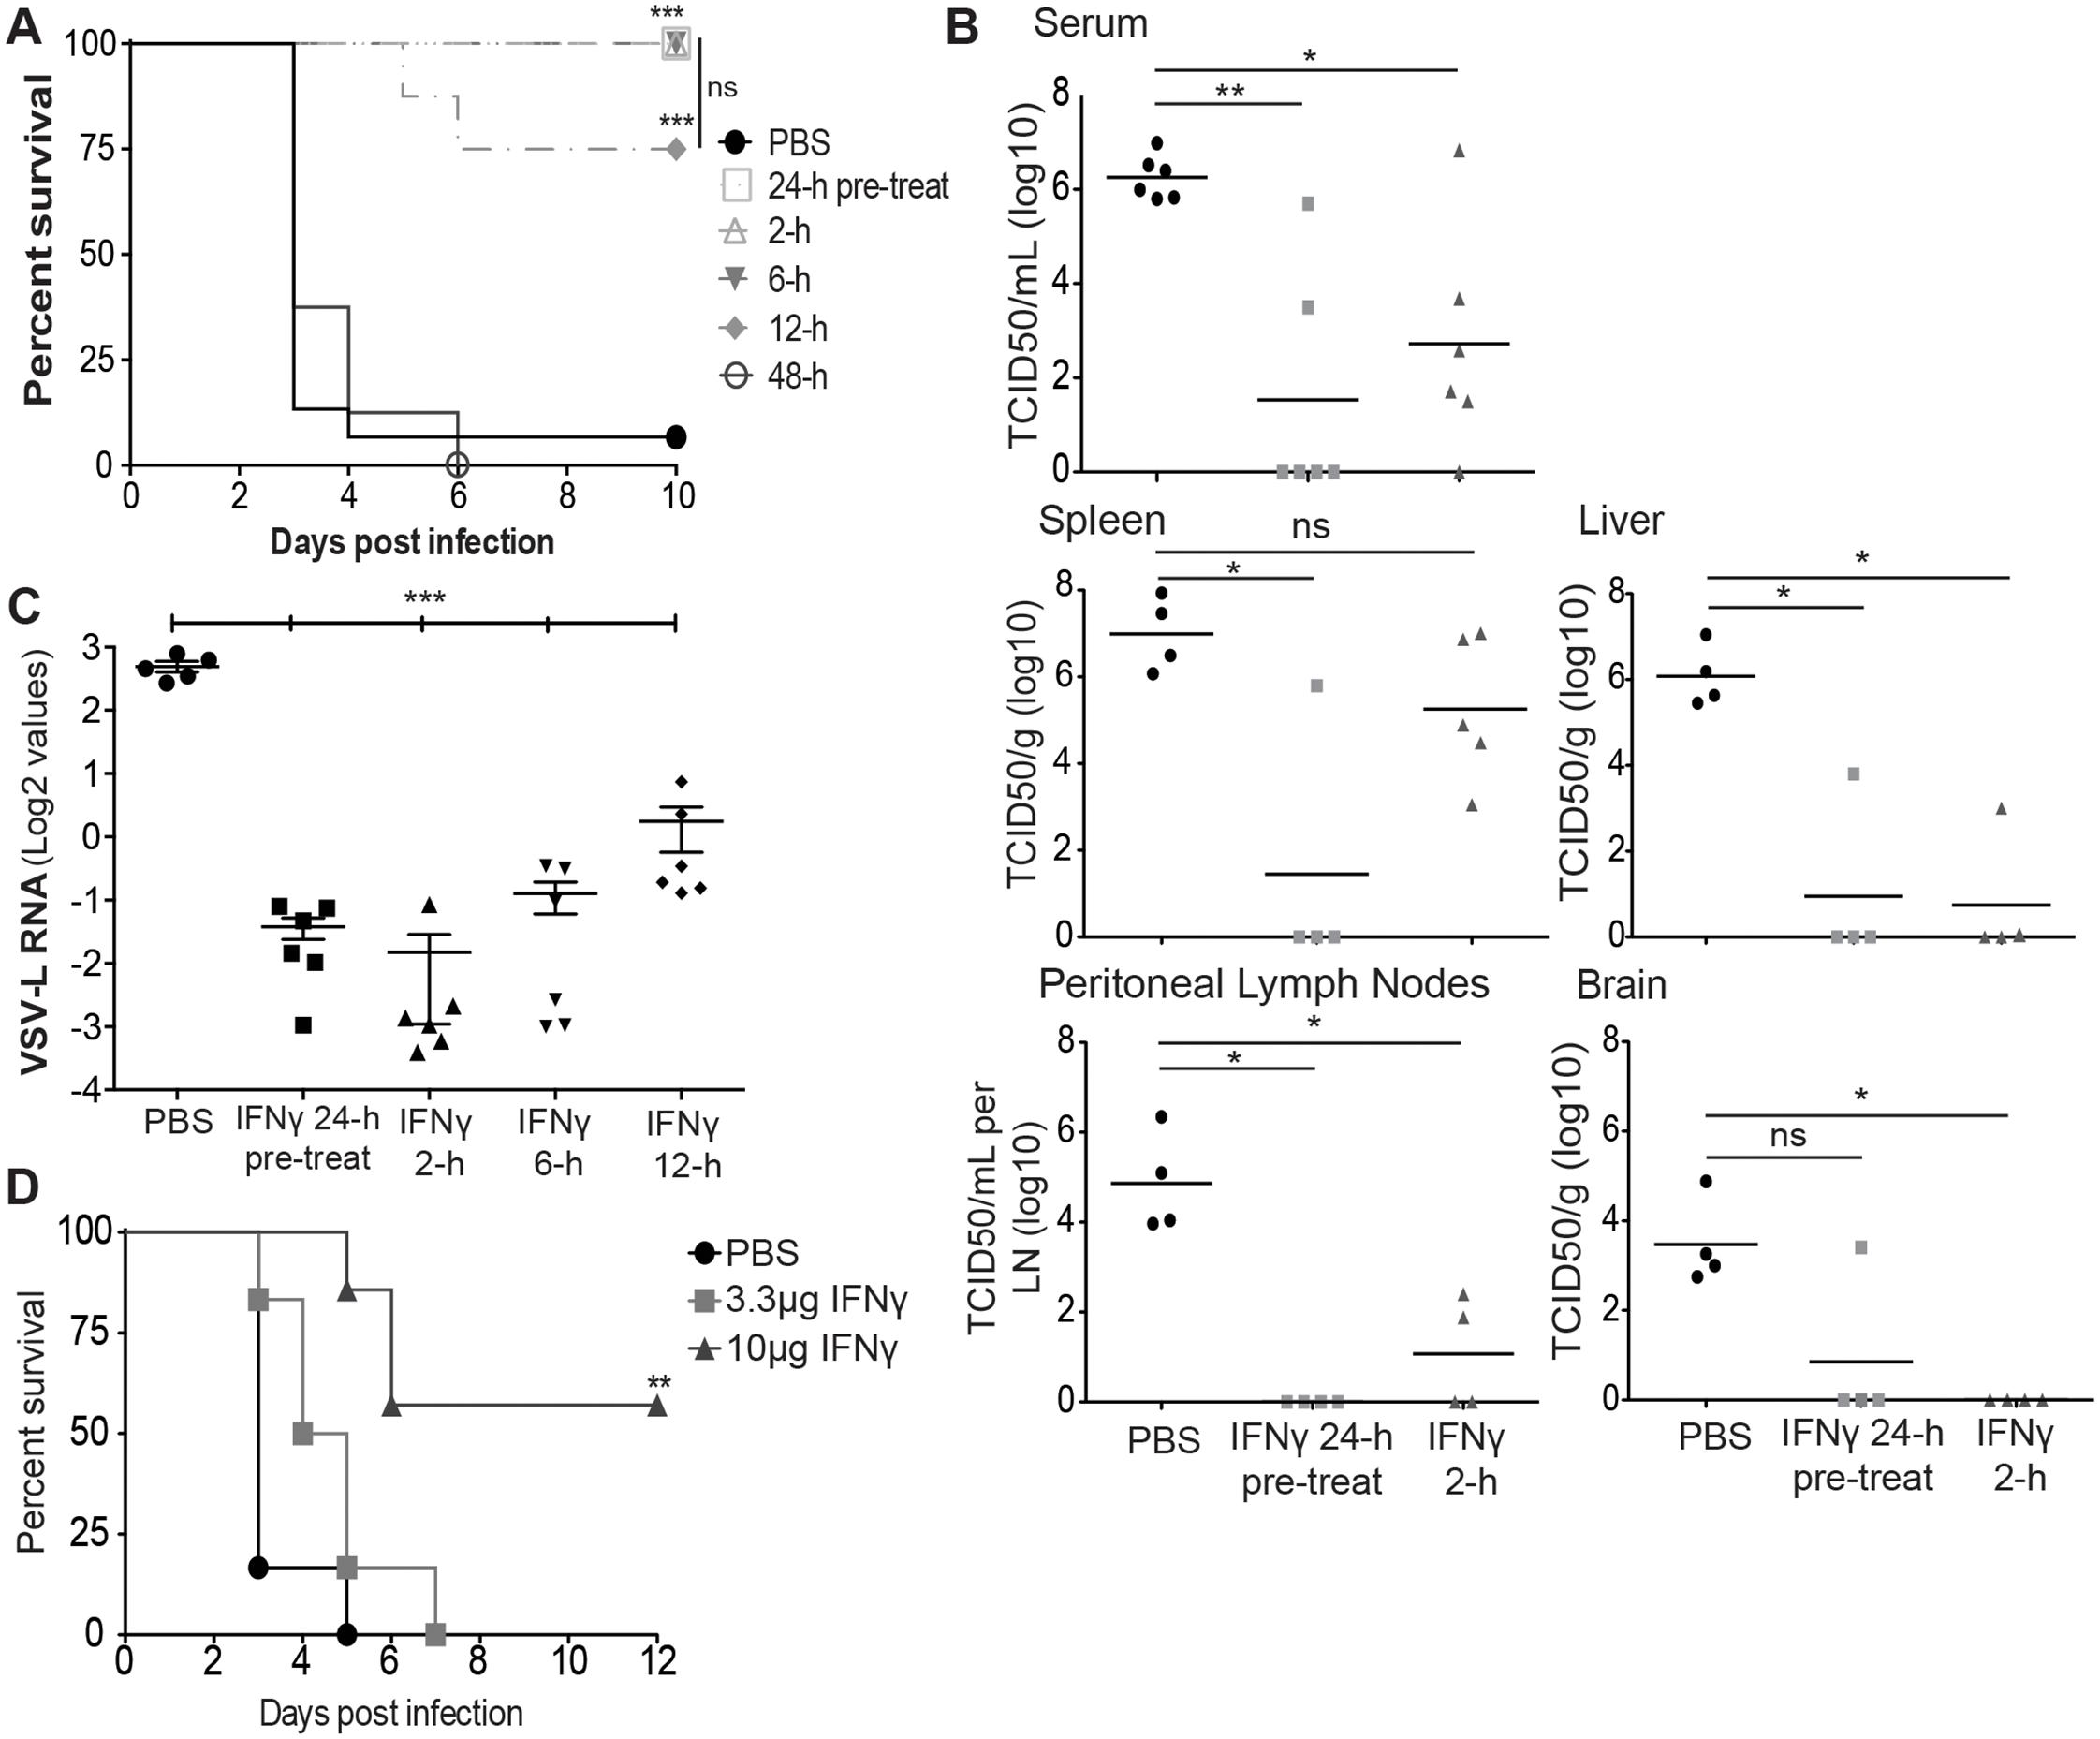 IFNγ reduces EBOV-GP/rVSV morbidity and mortality.